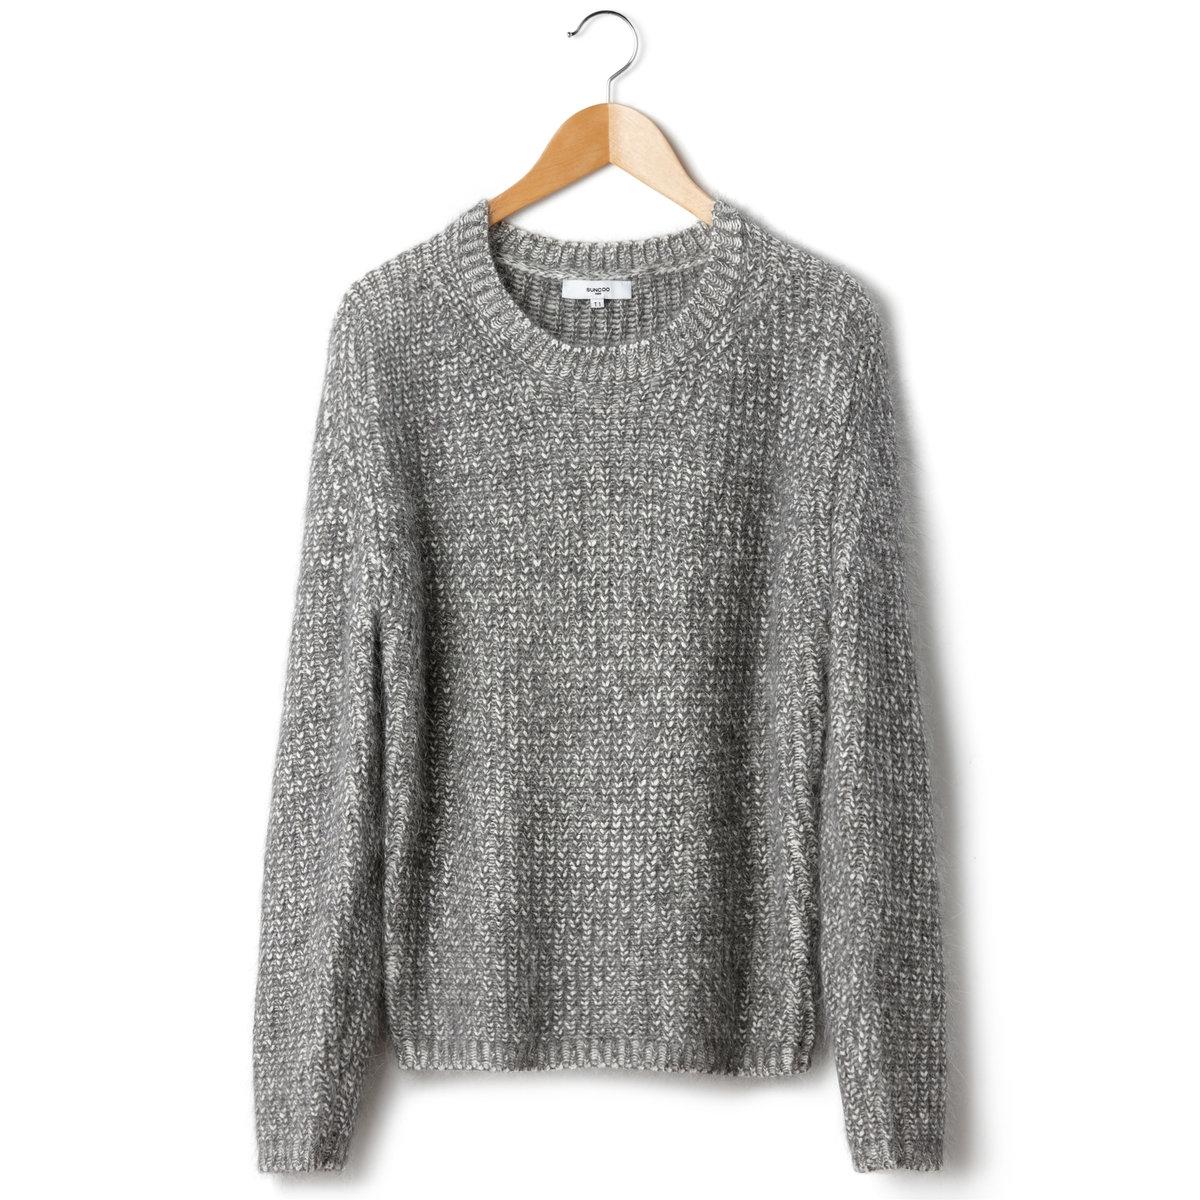 Пуловер<br><br>Цвет: серый меланж<br>Размер: 2(M)